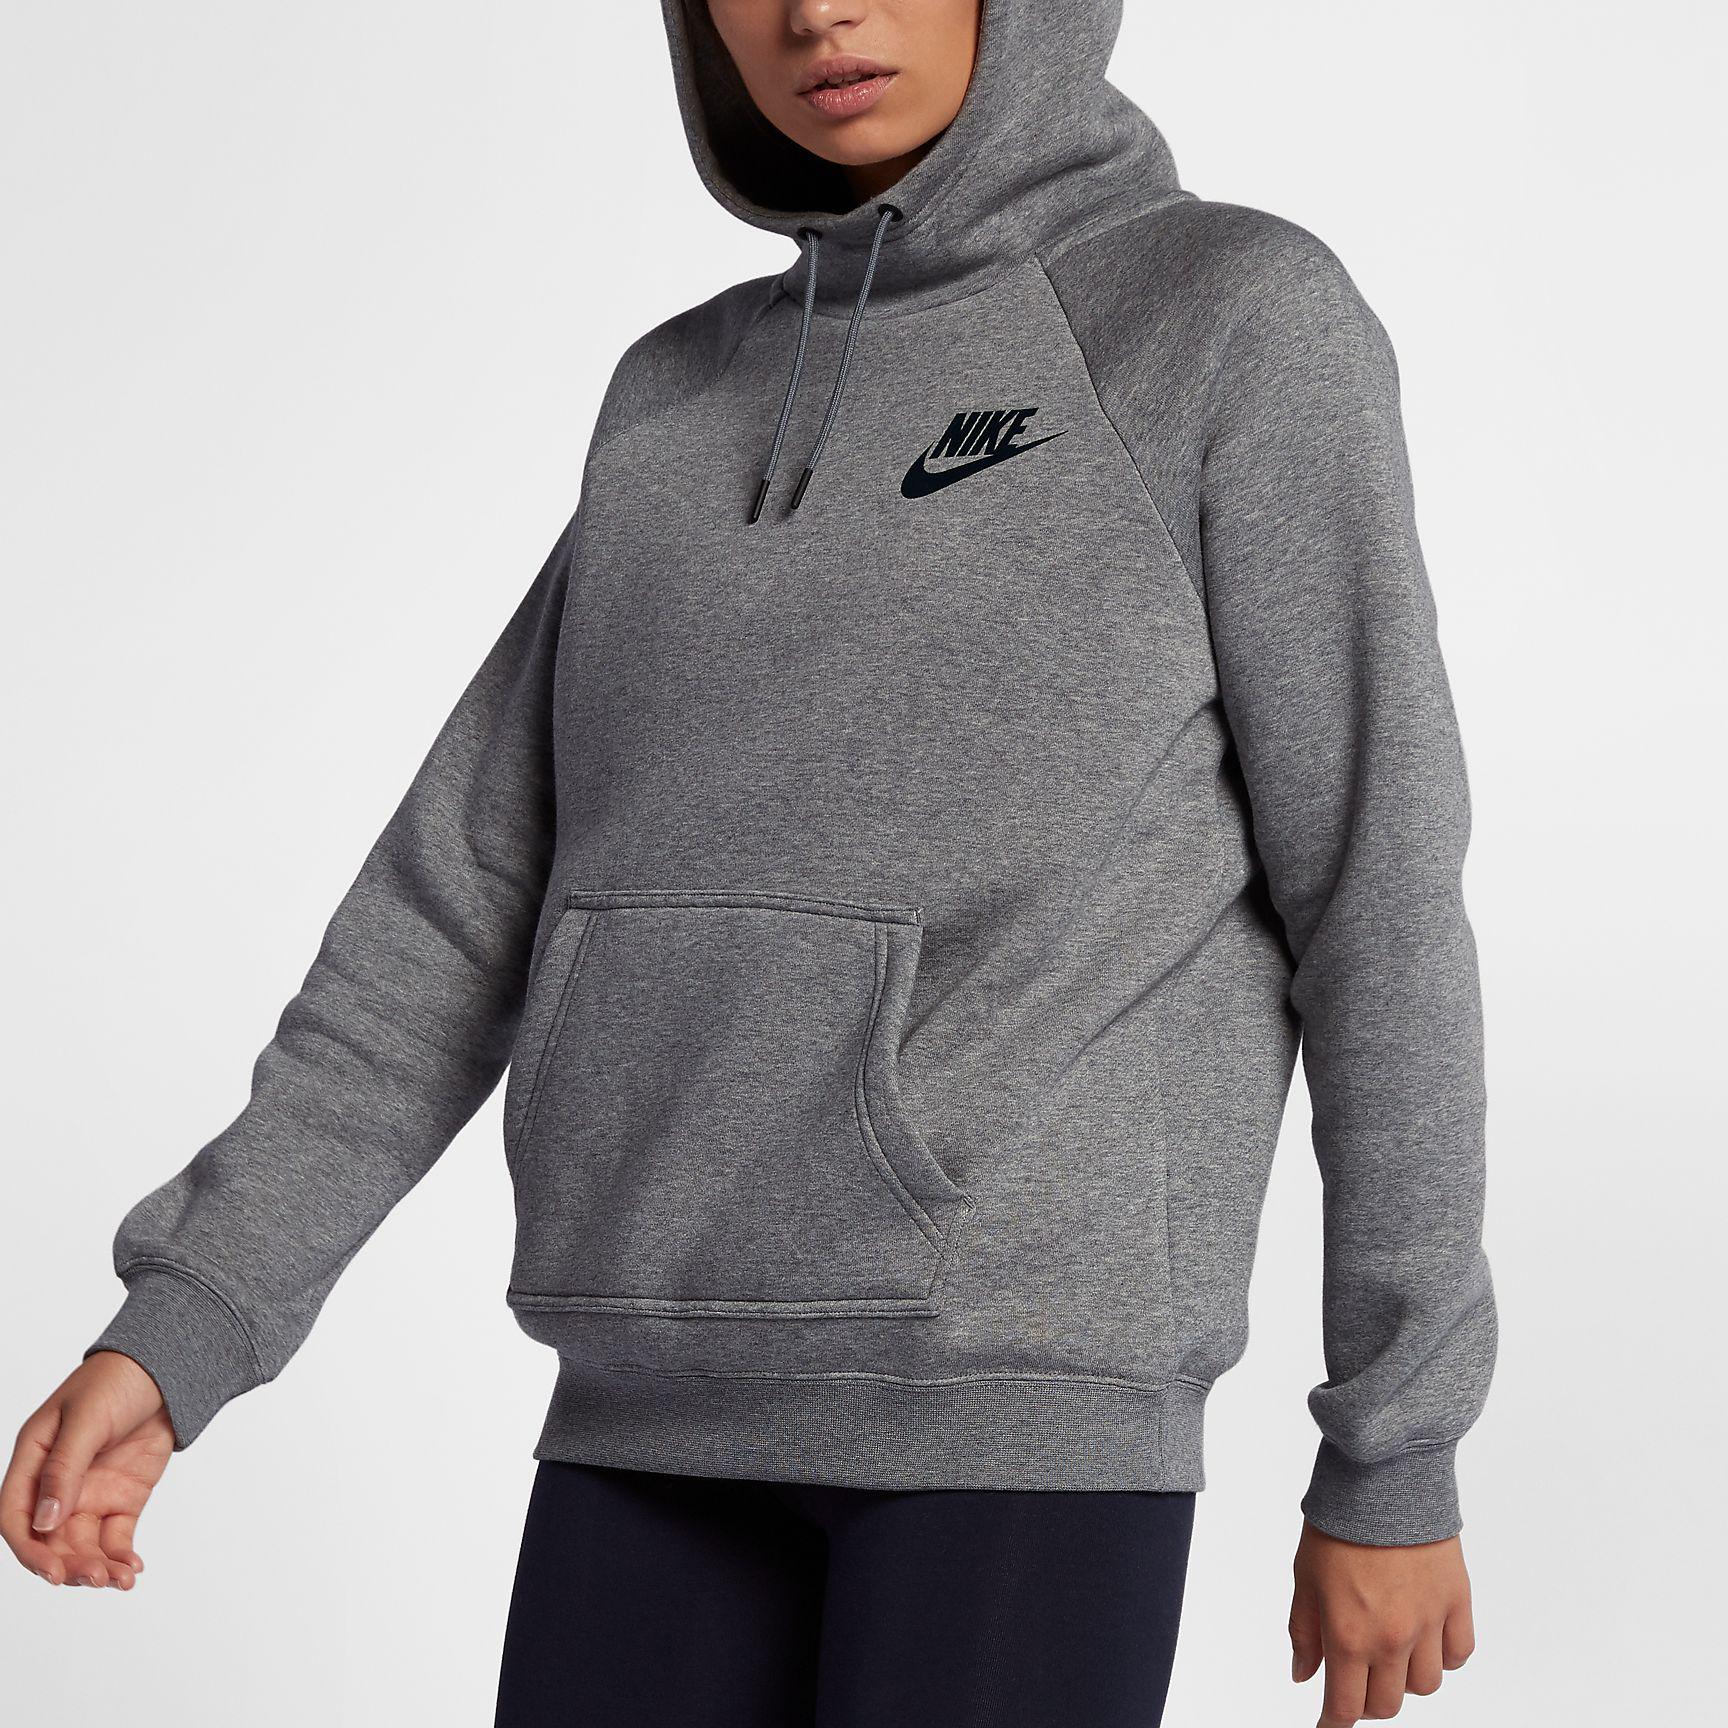 76e48c08df20 Nike Womens Sportswear Rally Hoodie - Carbon Heather Cool Grey Black ...